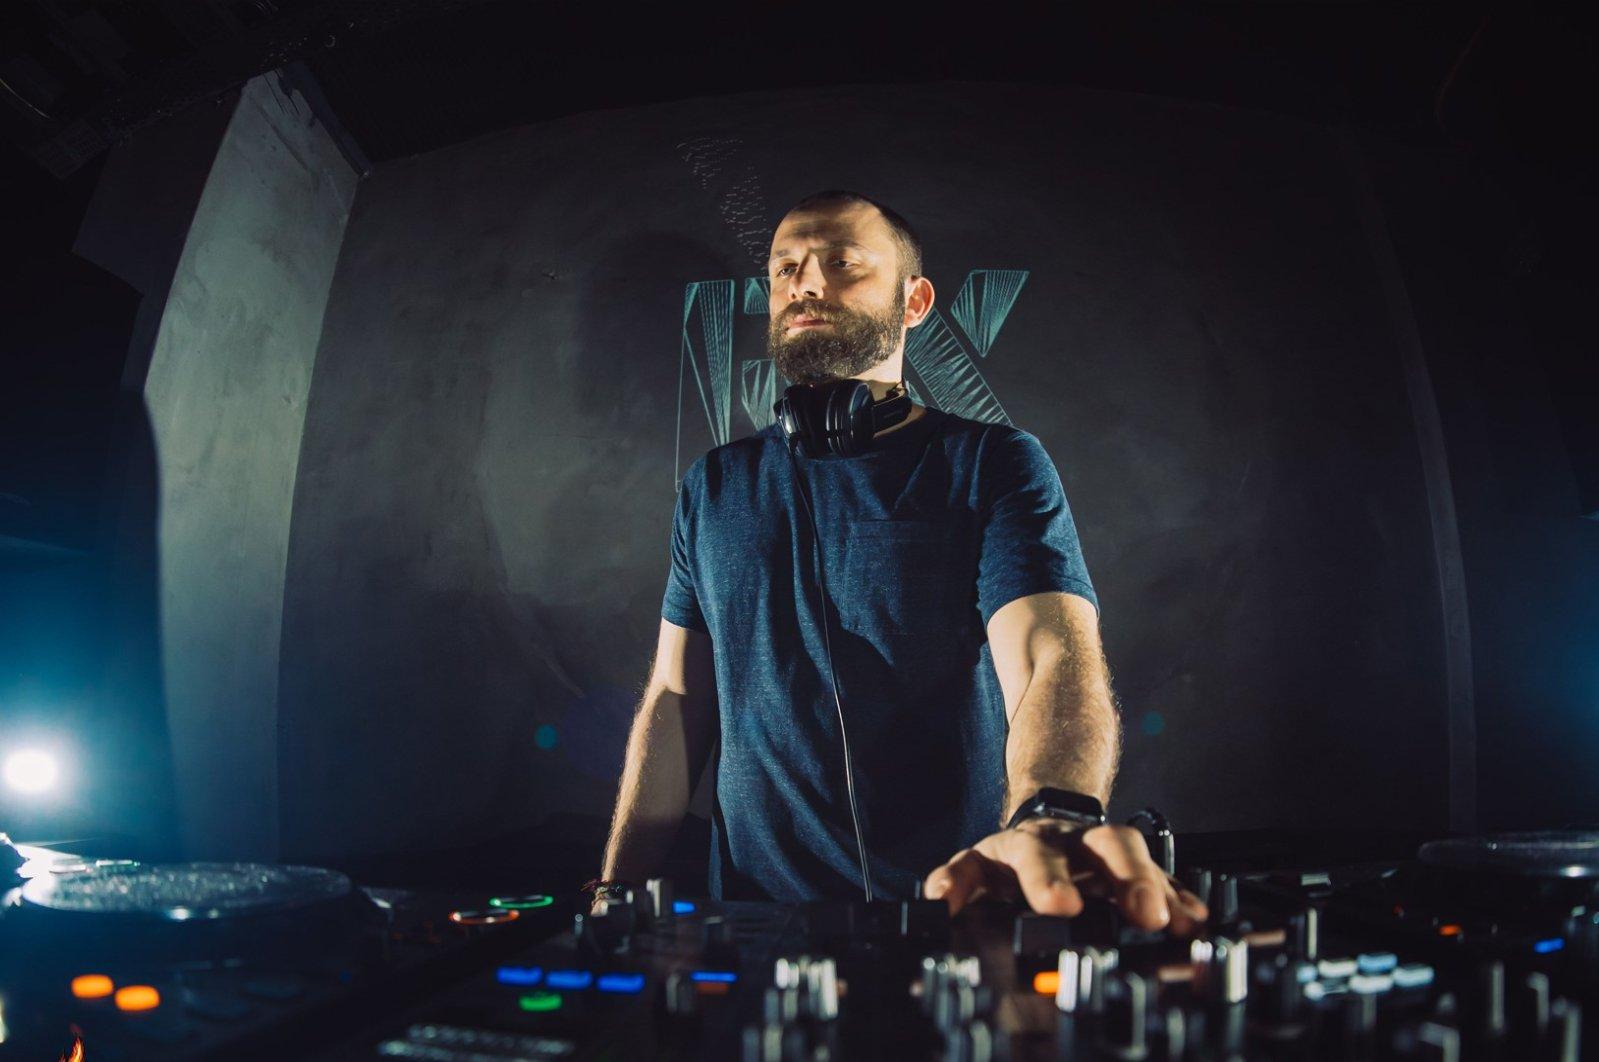 Turkey's local talents like Procombo will take the DJ set as part of the Big Burn Istanbul Digital Festival.